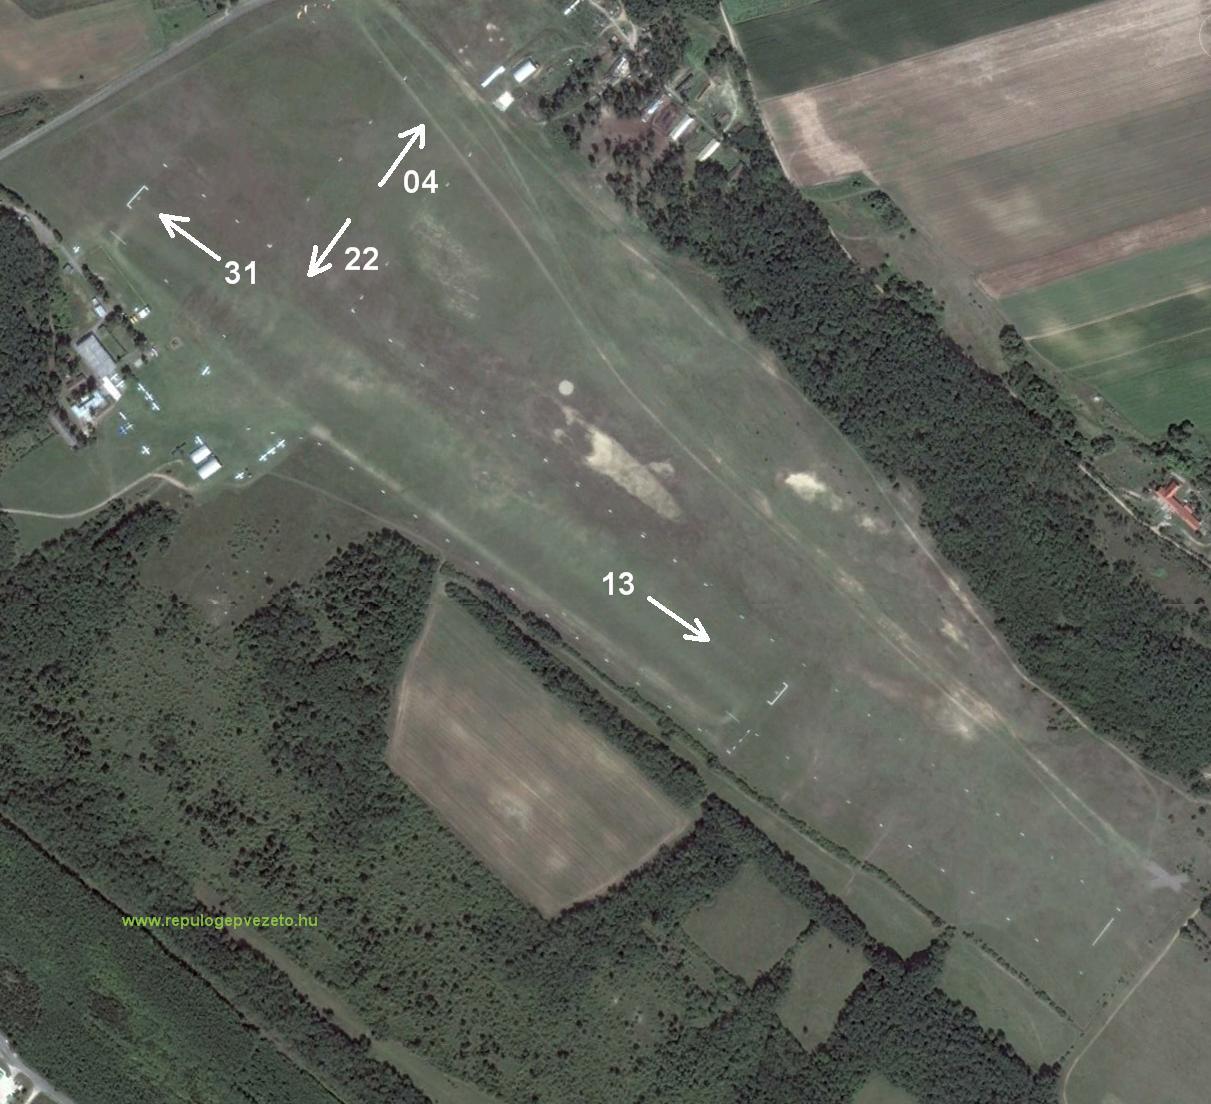 Gödöllő repülőtér / Gödöllő airport